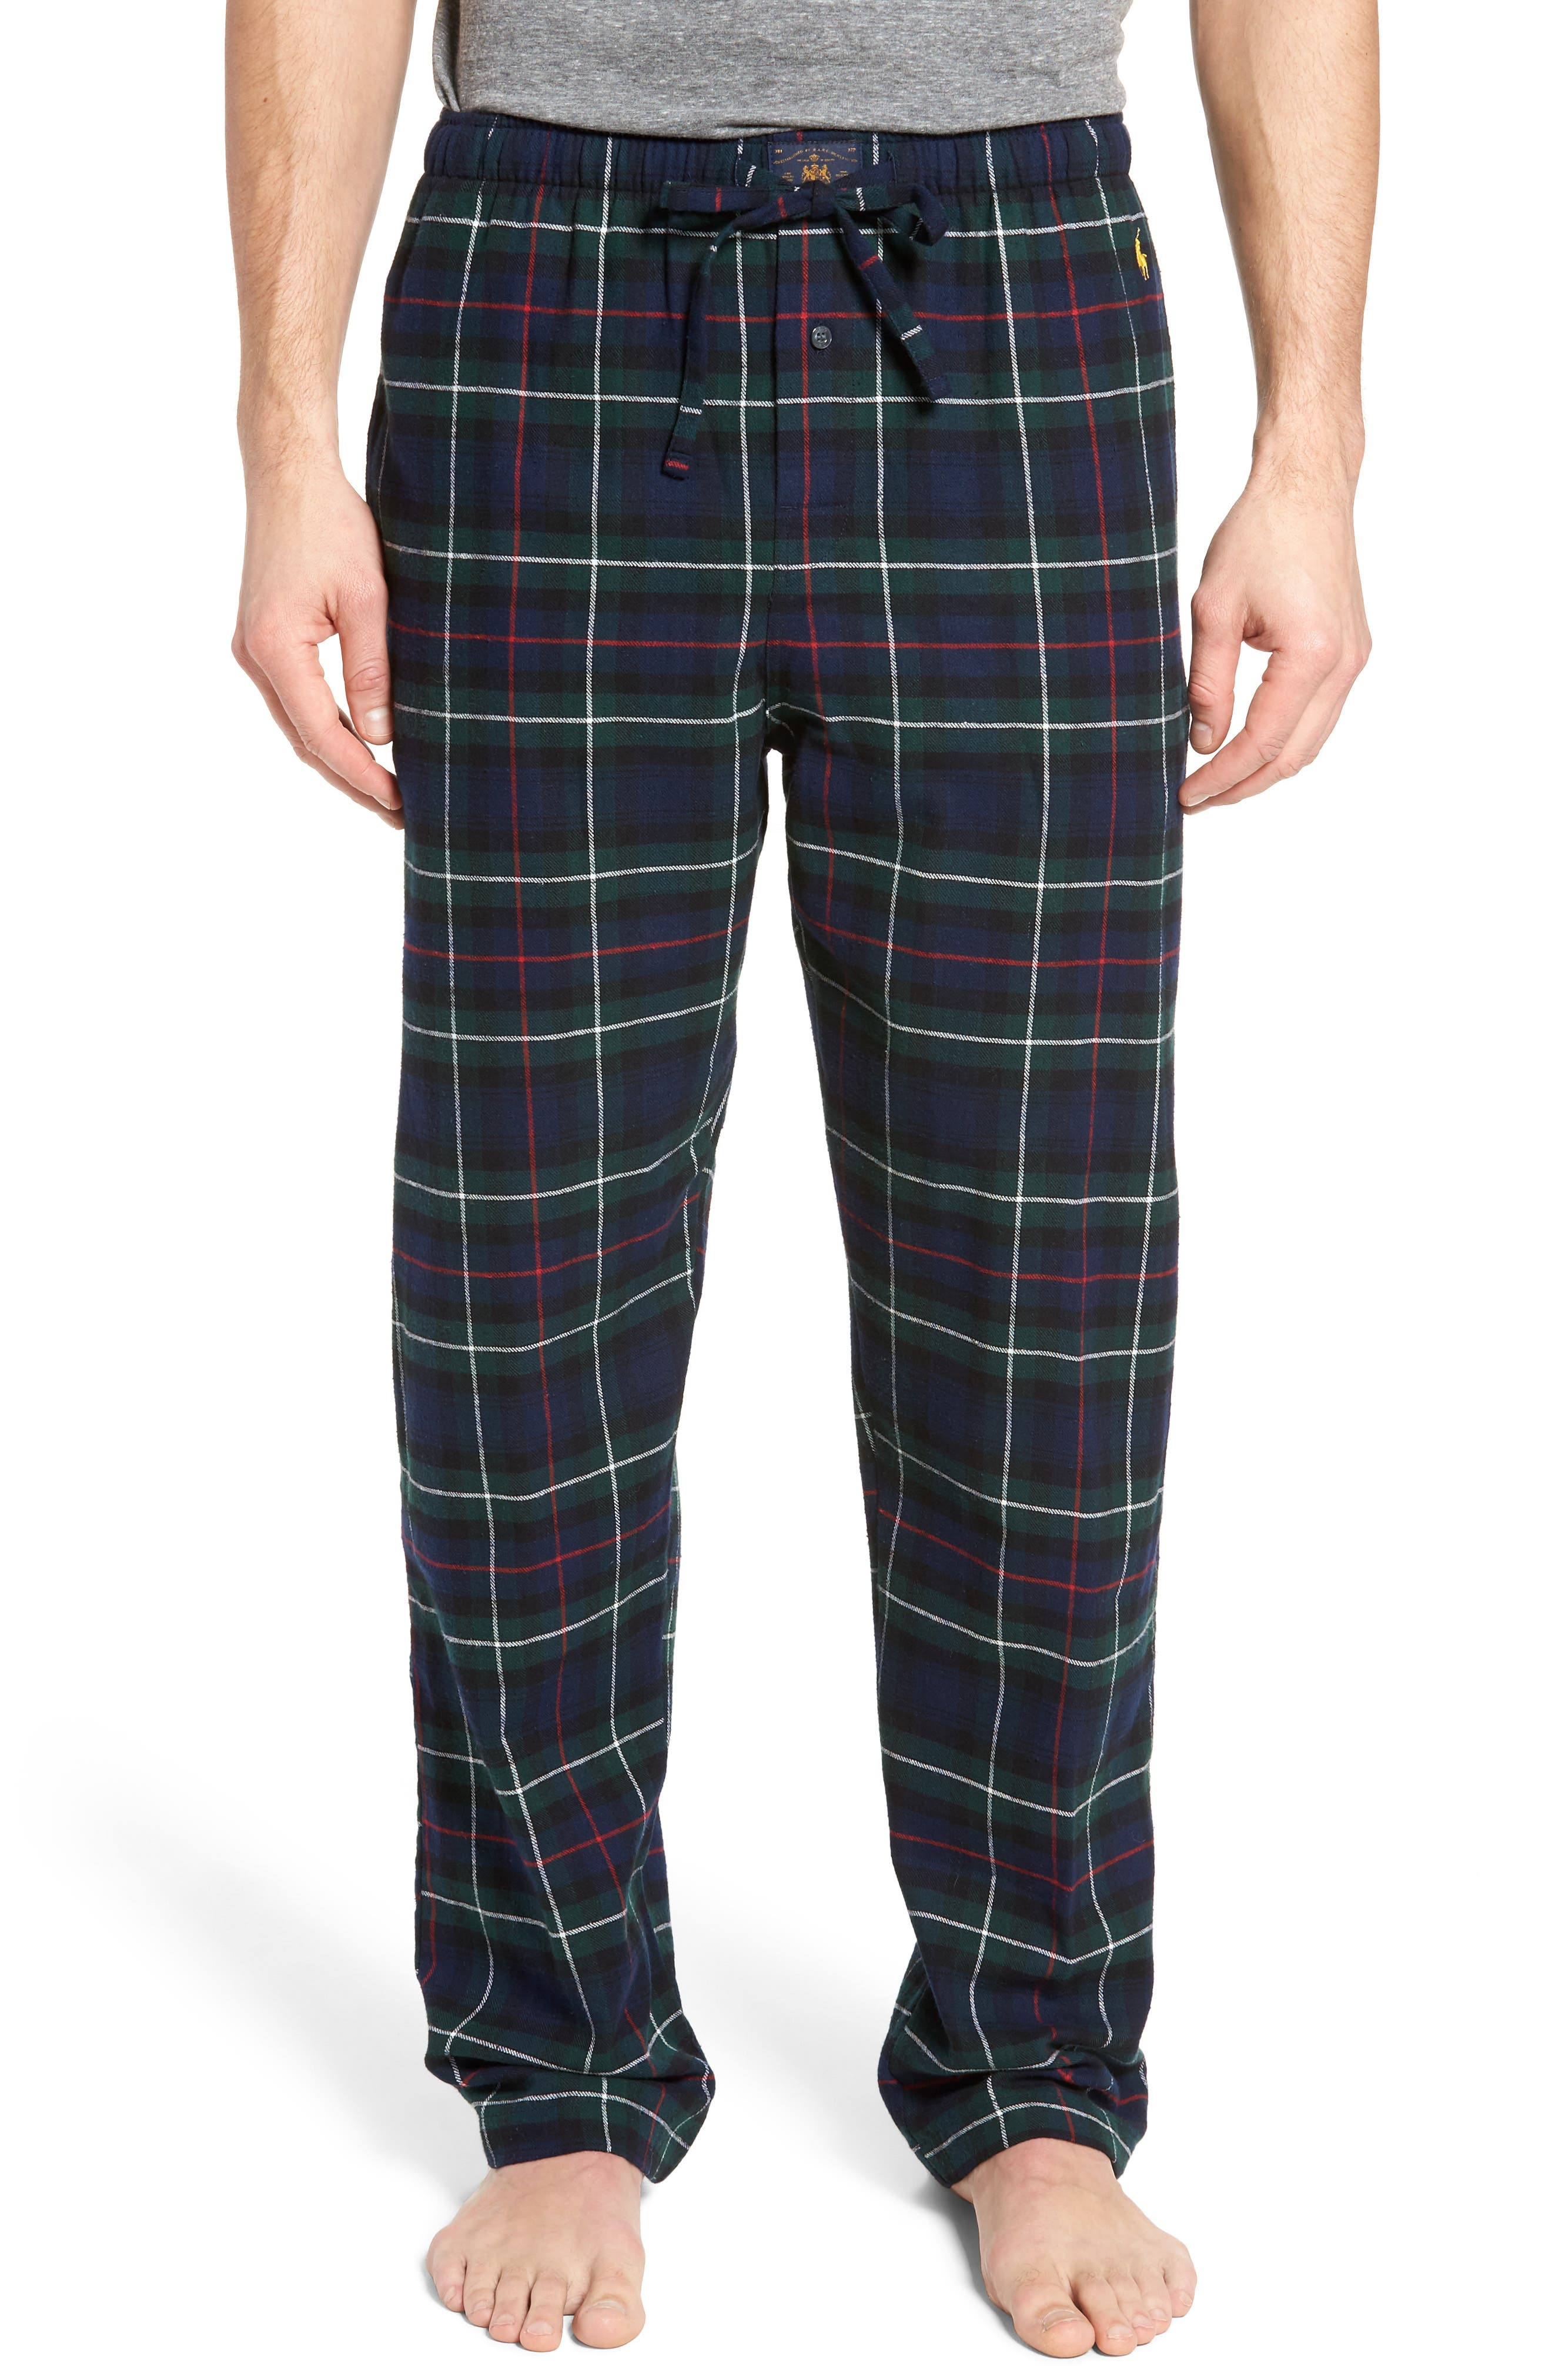 Flannel Pajama Pants,                             Main thumbnail 1, color,                             Blackwatch/ Cruise Navy/ Gold